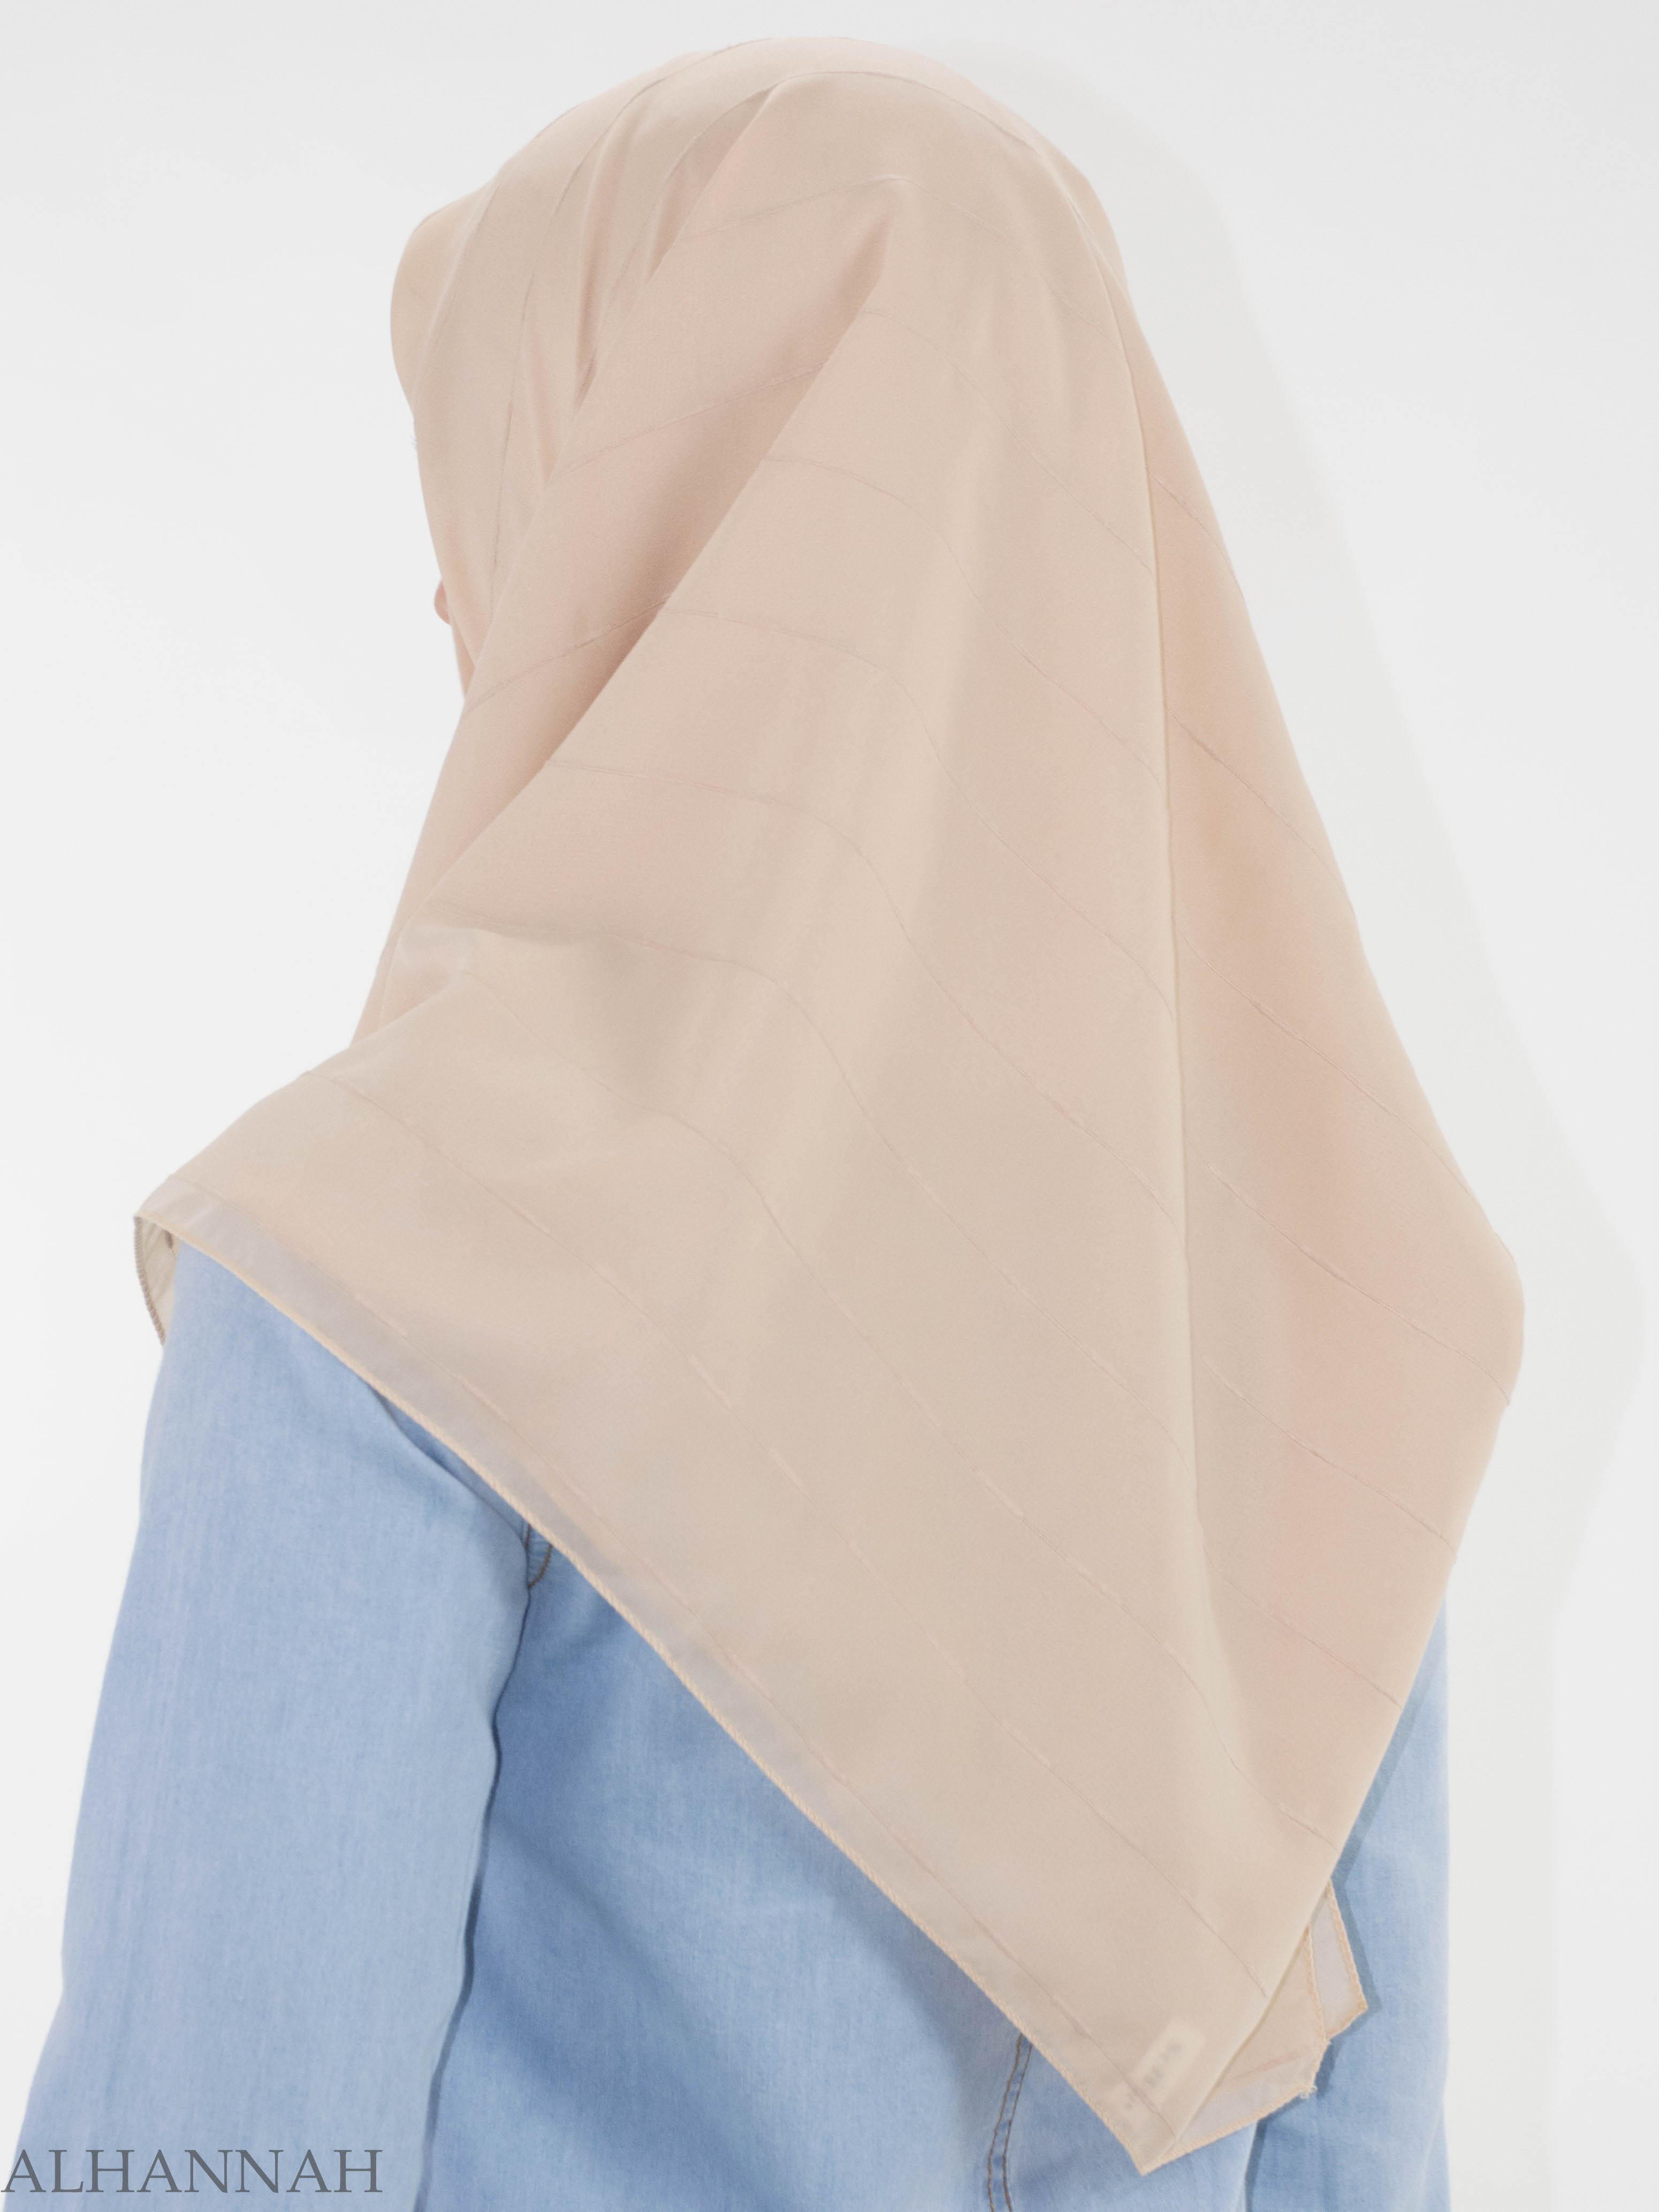 Pleated Square Hijab HI2147 (2)